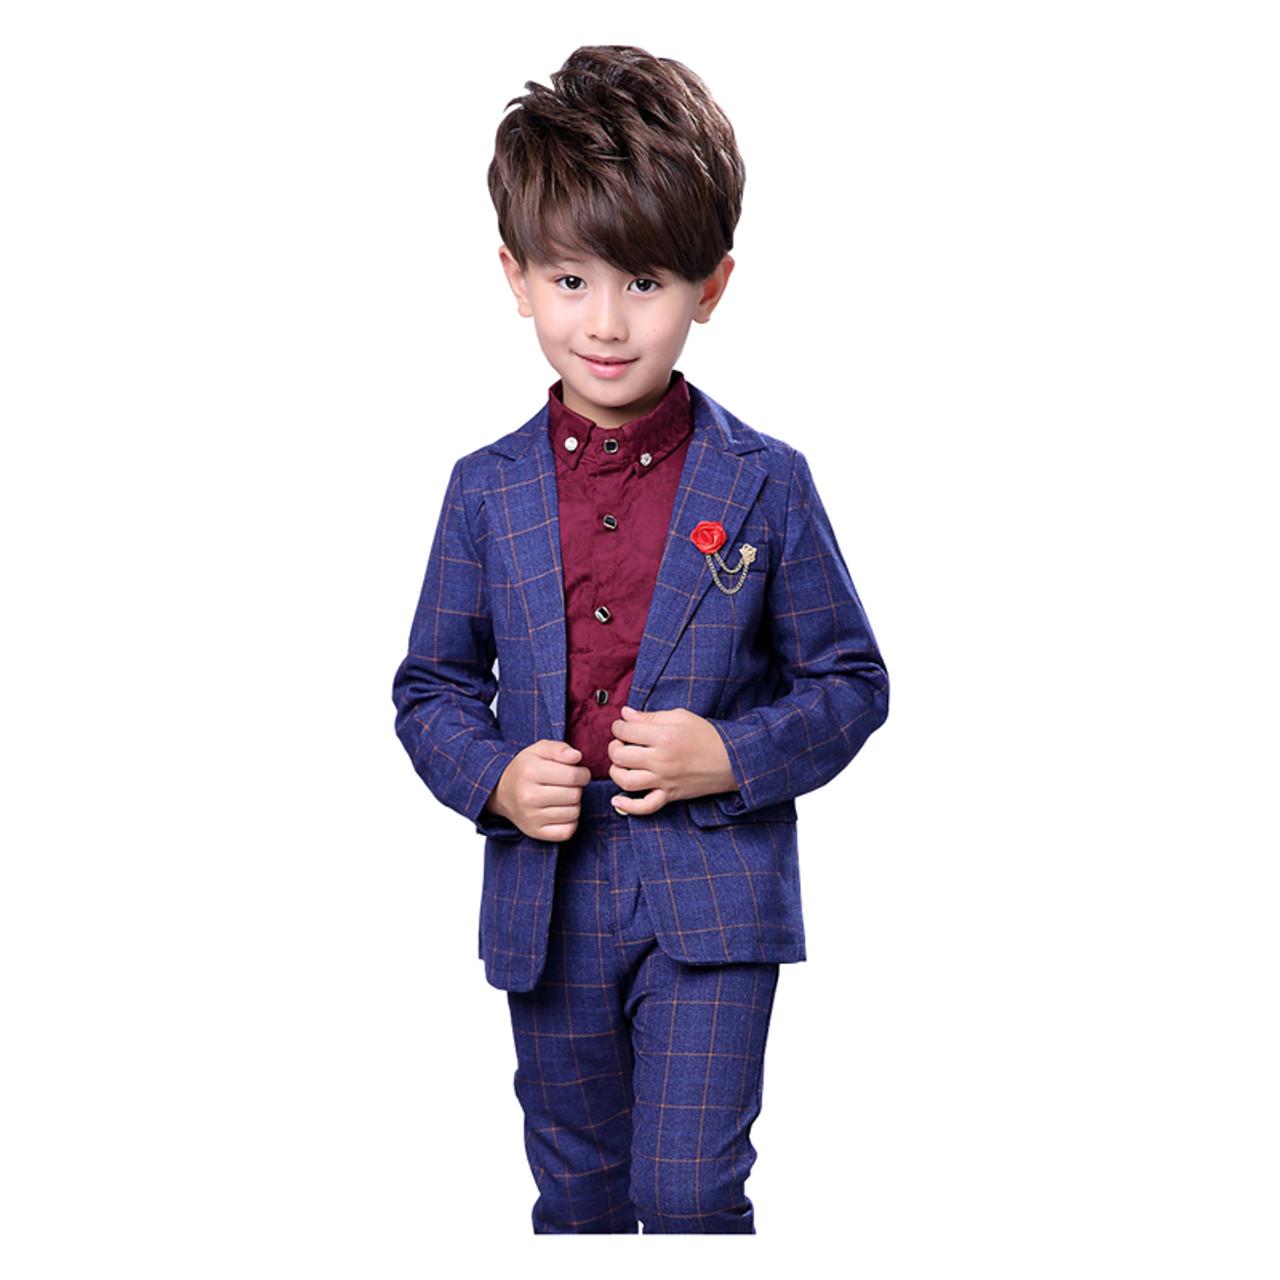 541b1232cdd8a ... Prince Boys 2Pcs Plaid Formal Wedding Suit England Style Boys Brooch  Blazers Kids Tuxedos Boys School ...